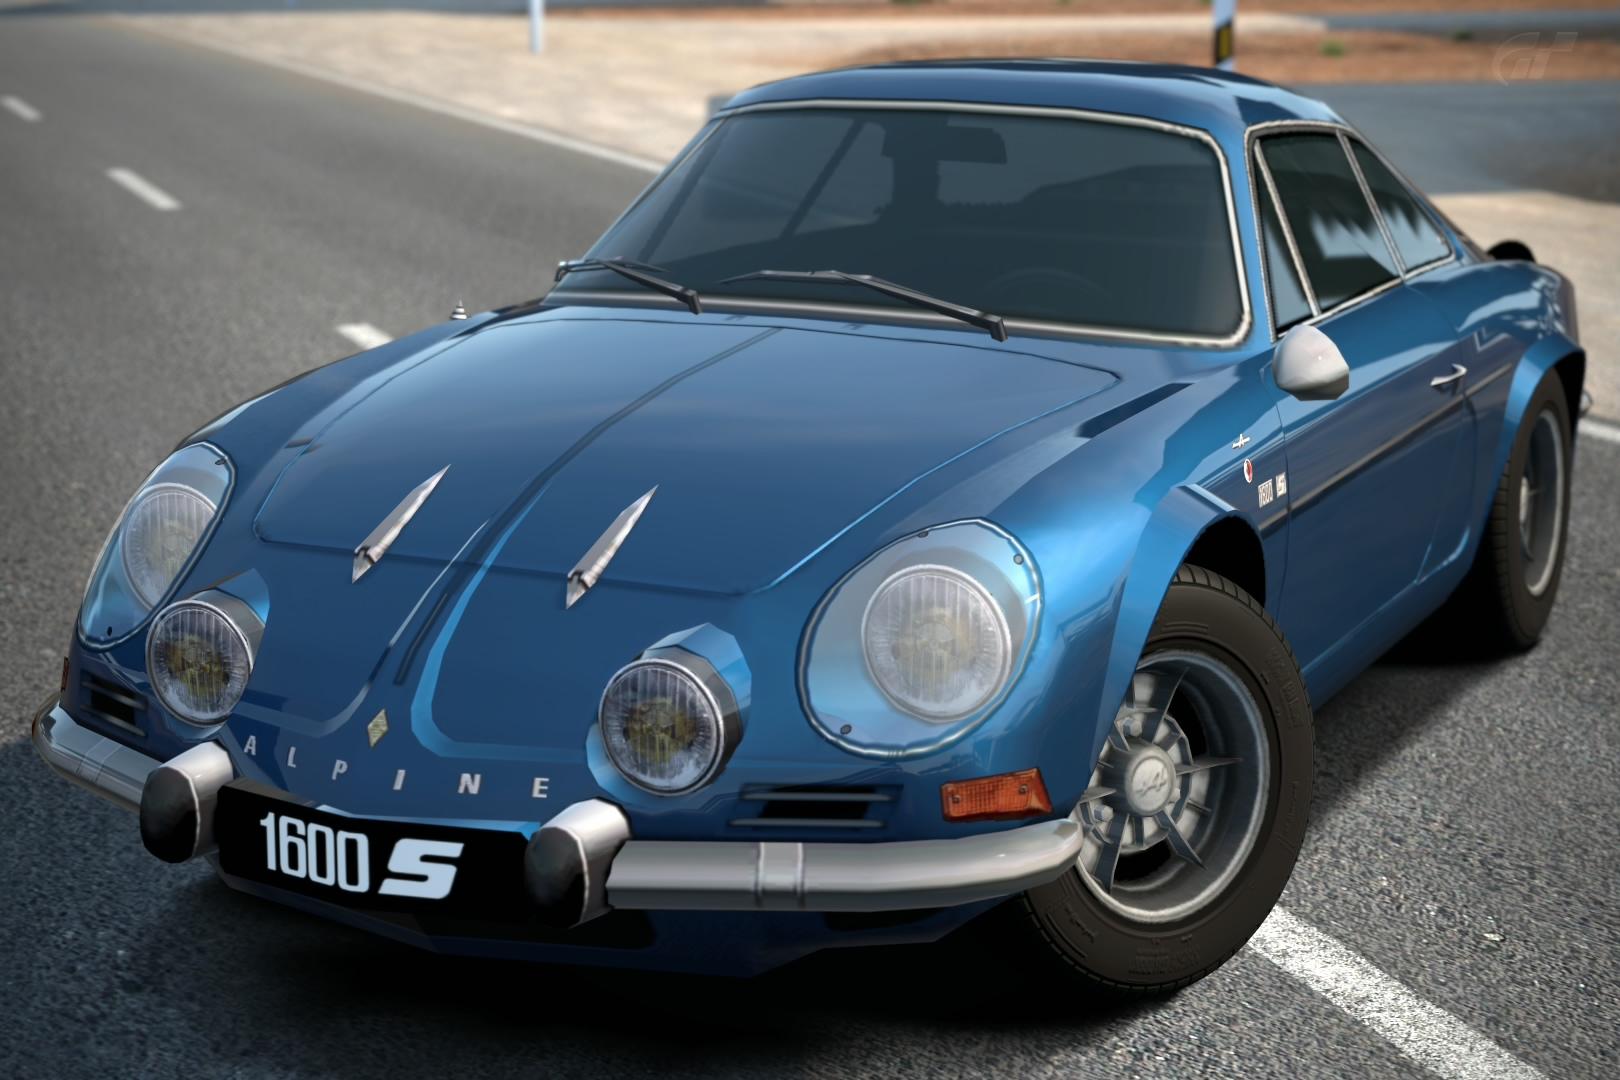 Alpine A110 1600S '73